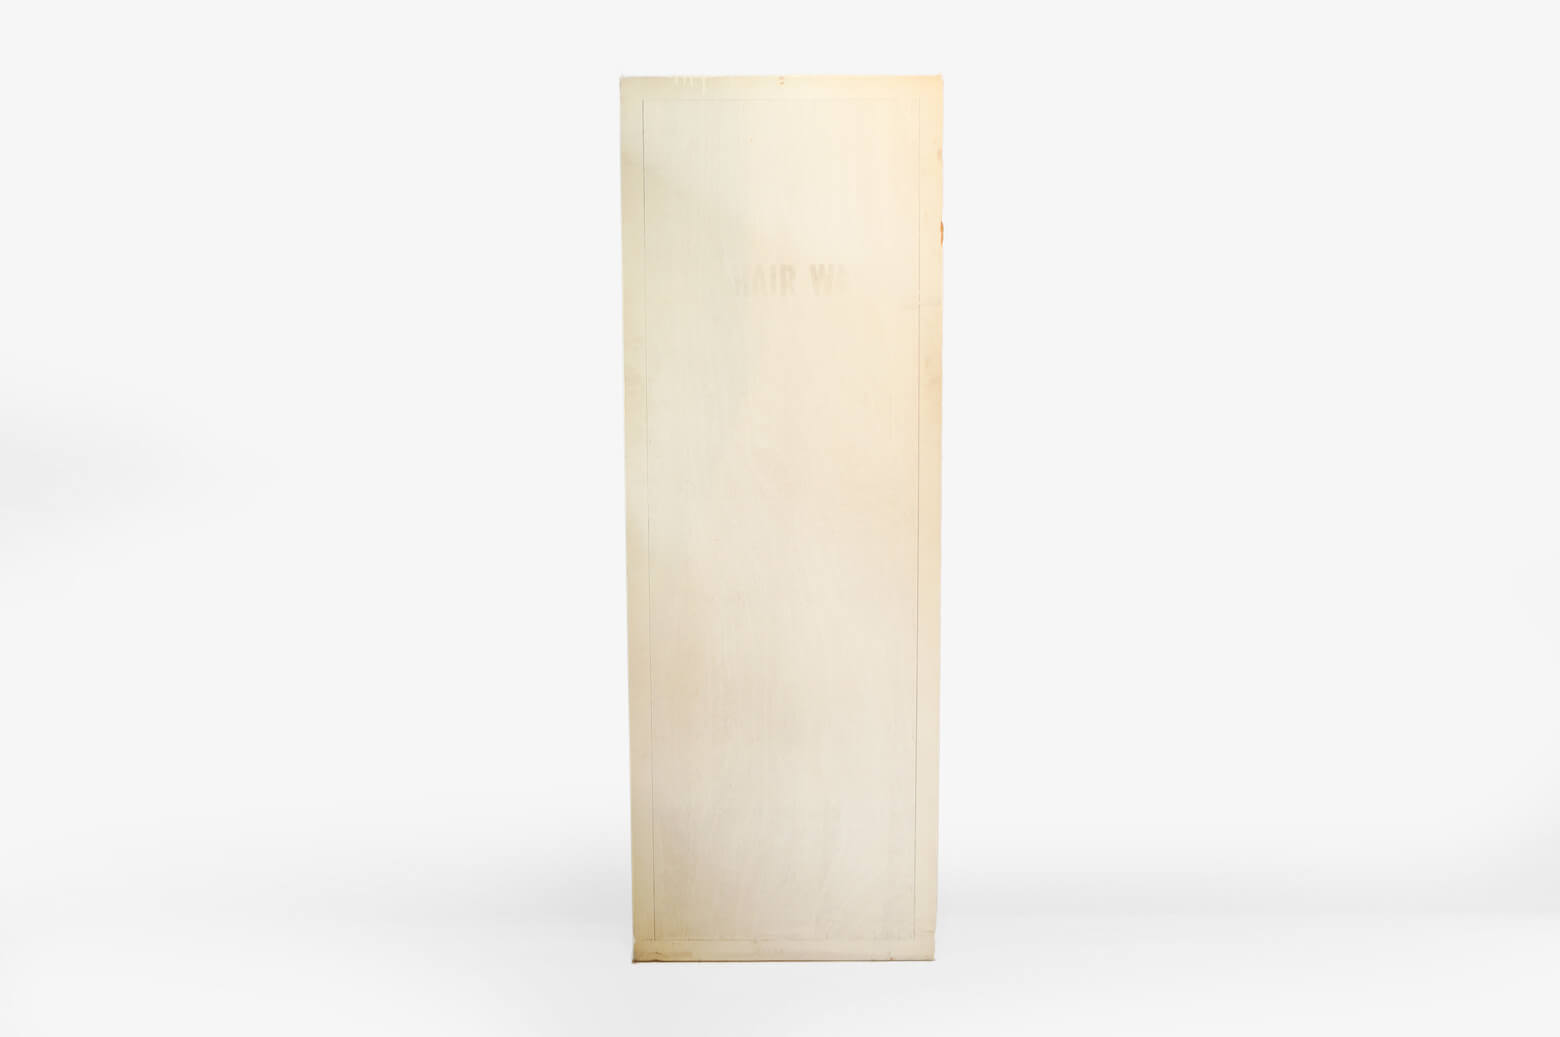 Full Length Mirror Shabby Chic Style/大型 姿見 シャビーシックスタイル